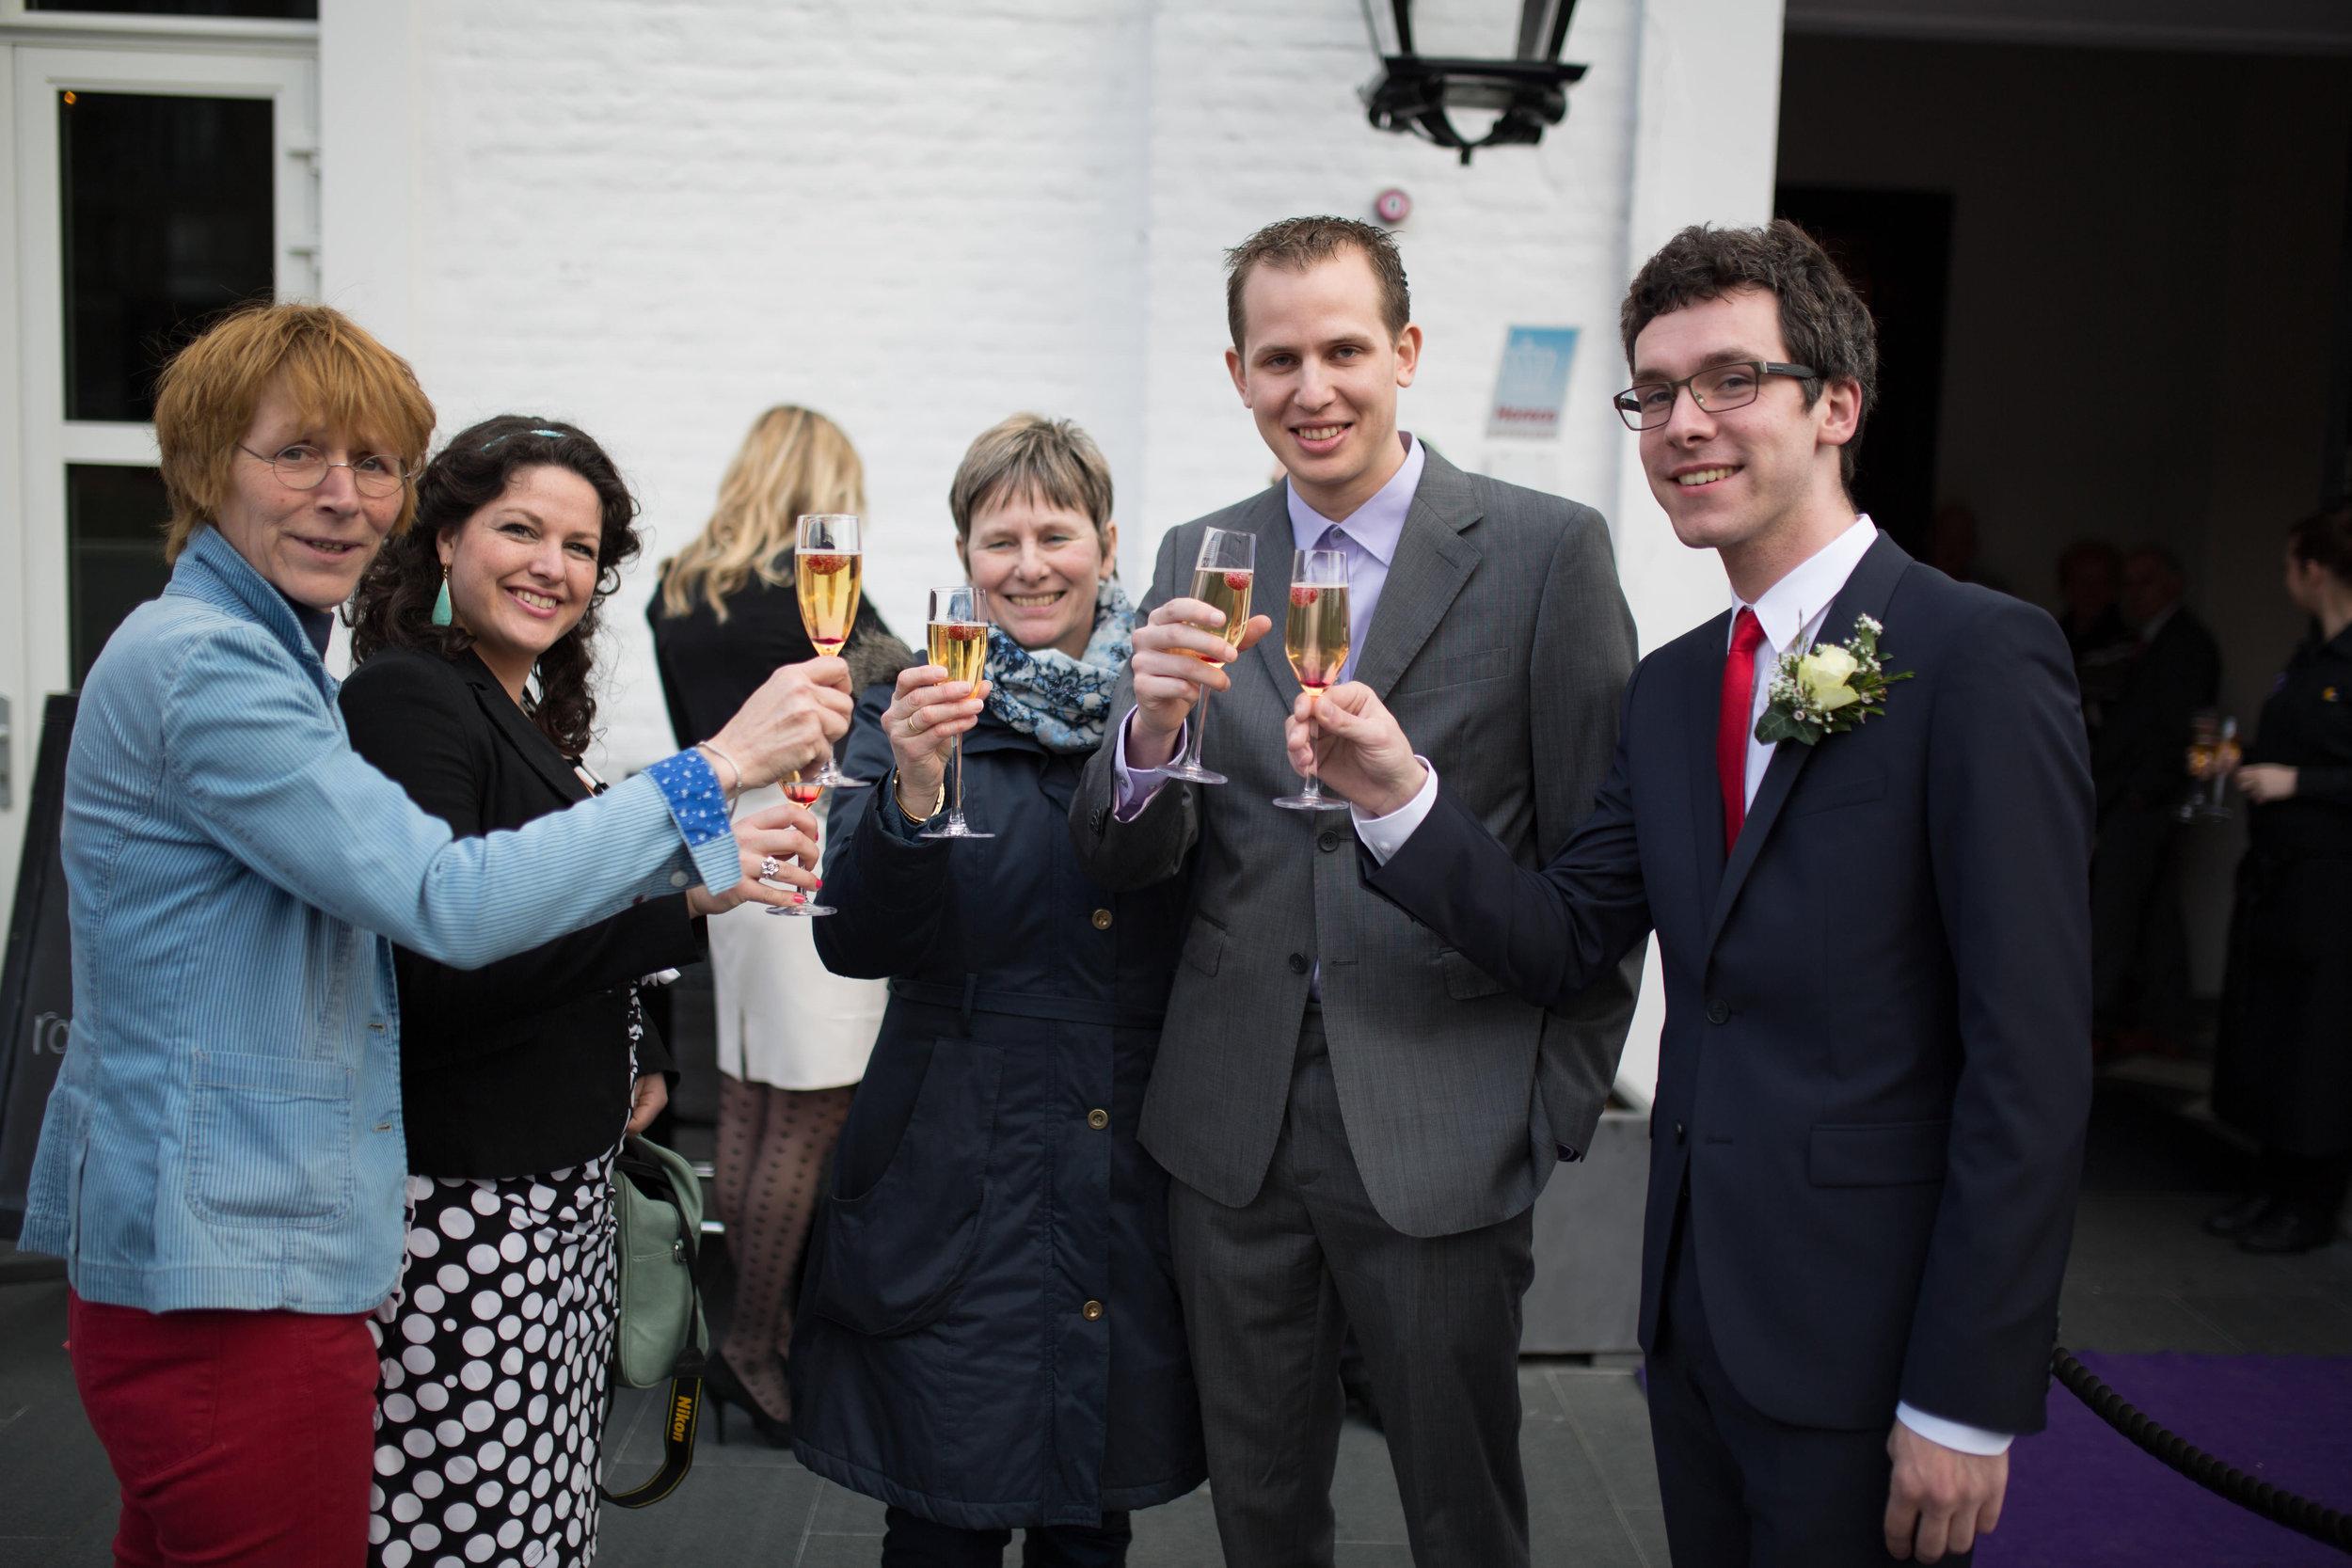 bruidsfotografie-trouwreprotage-huwelijksfotografie-bruidsfotograaf-feestfotografie-Danielle-Benjamin-10.jpg